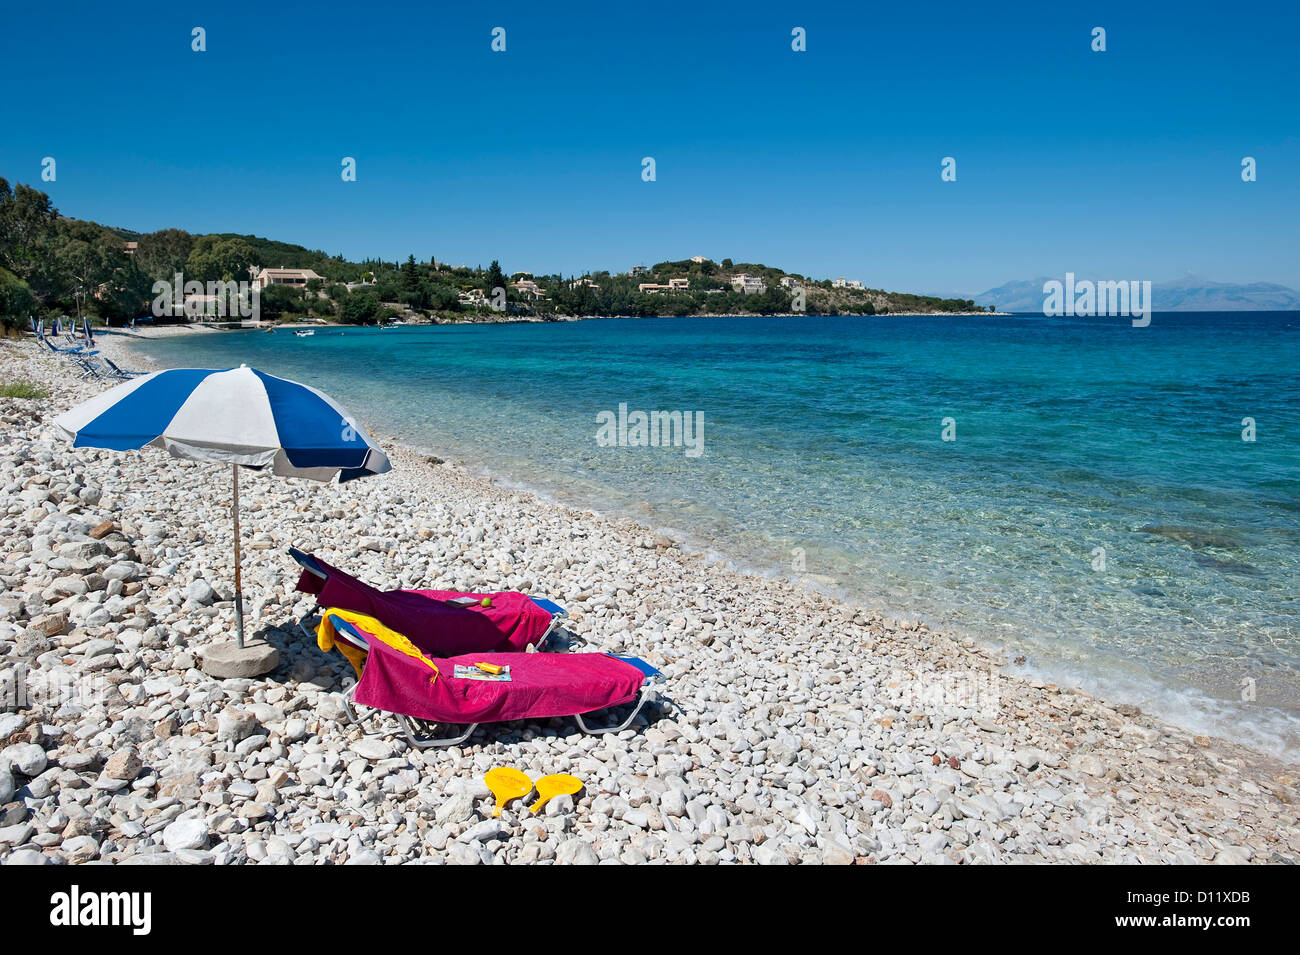 Coyevinas Beach, Corfu, Ionian Islands, Greece - Stock Image